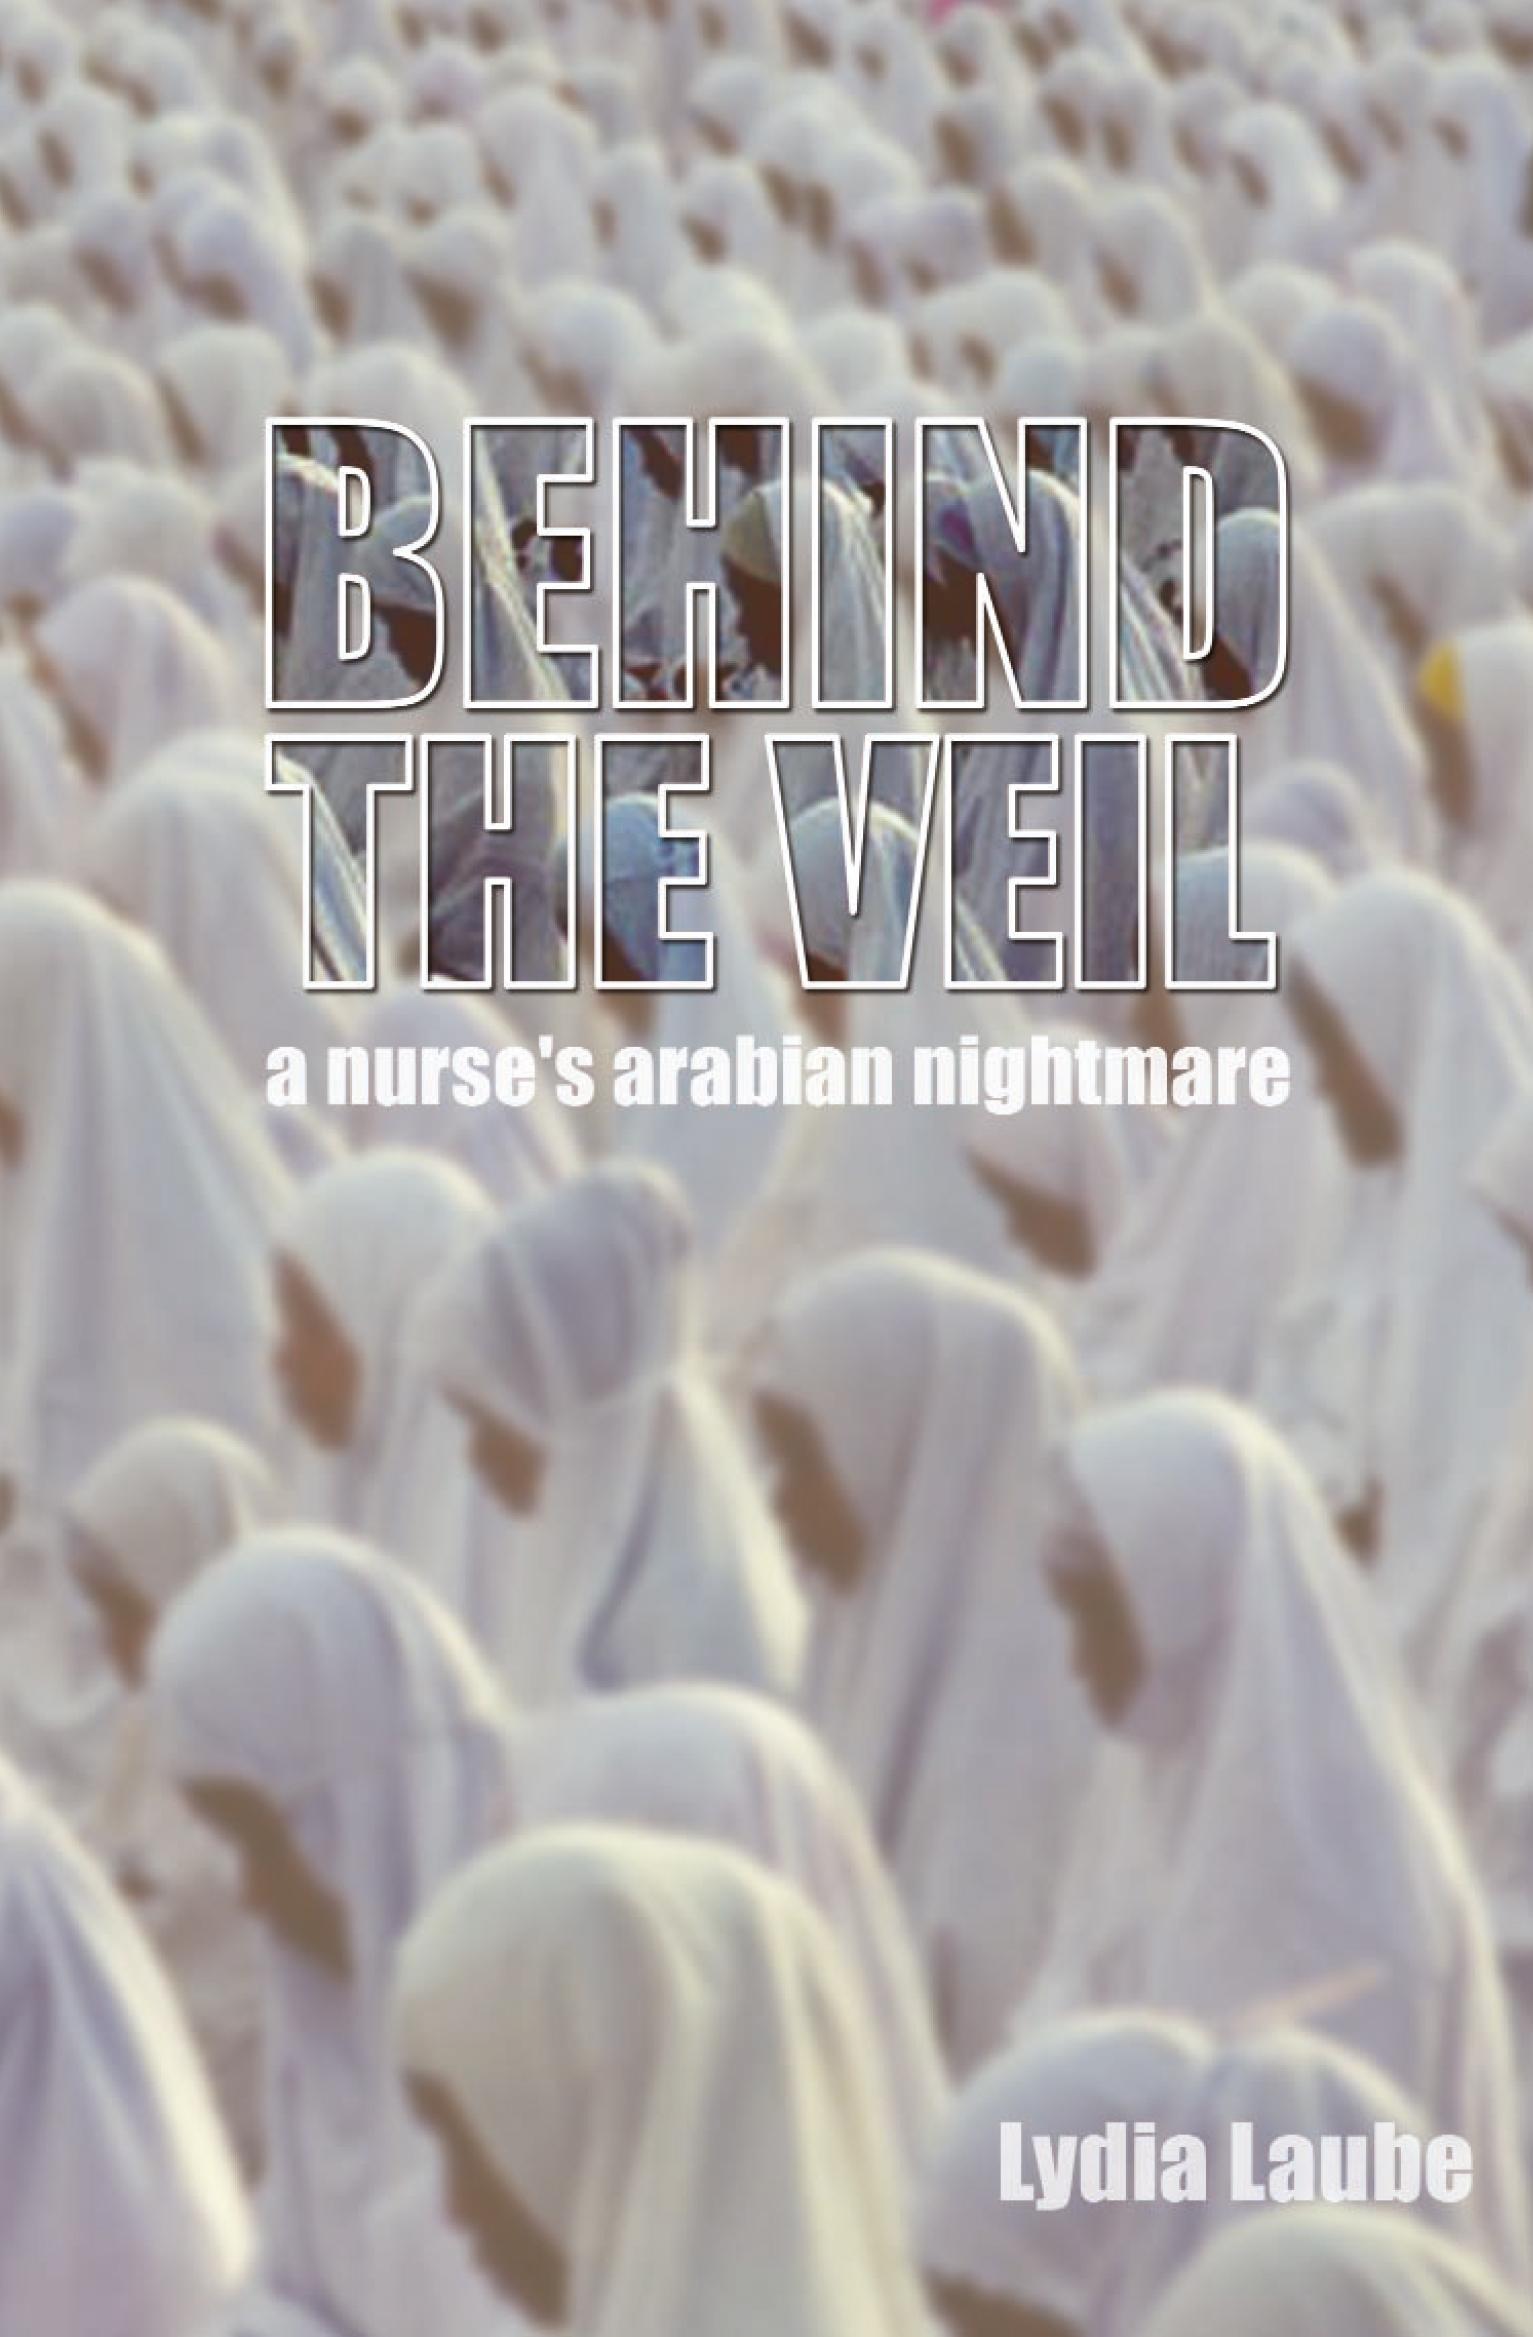 Behind the Veil by Lydia Laube | Eye Books